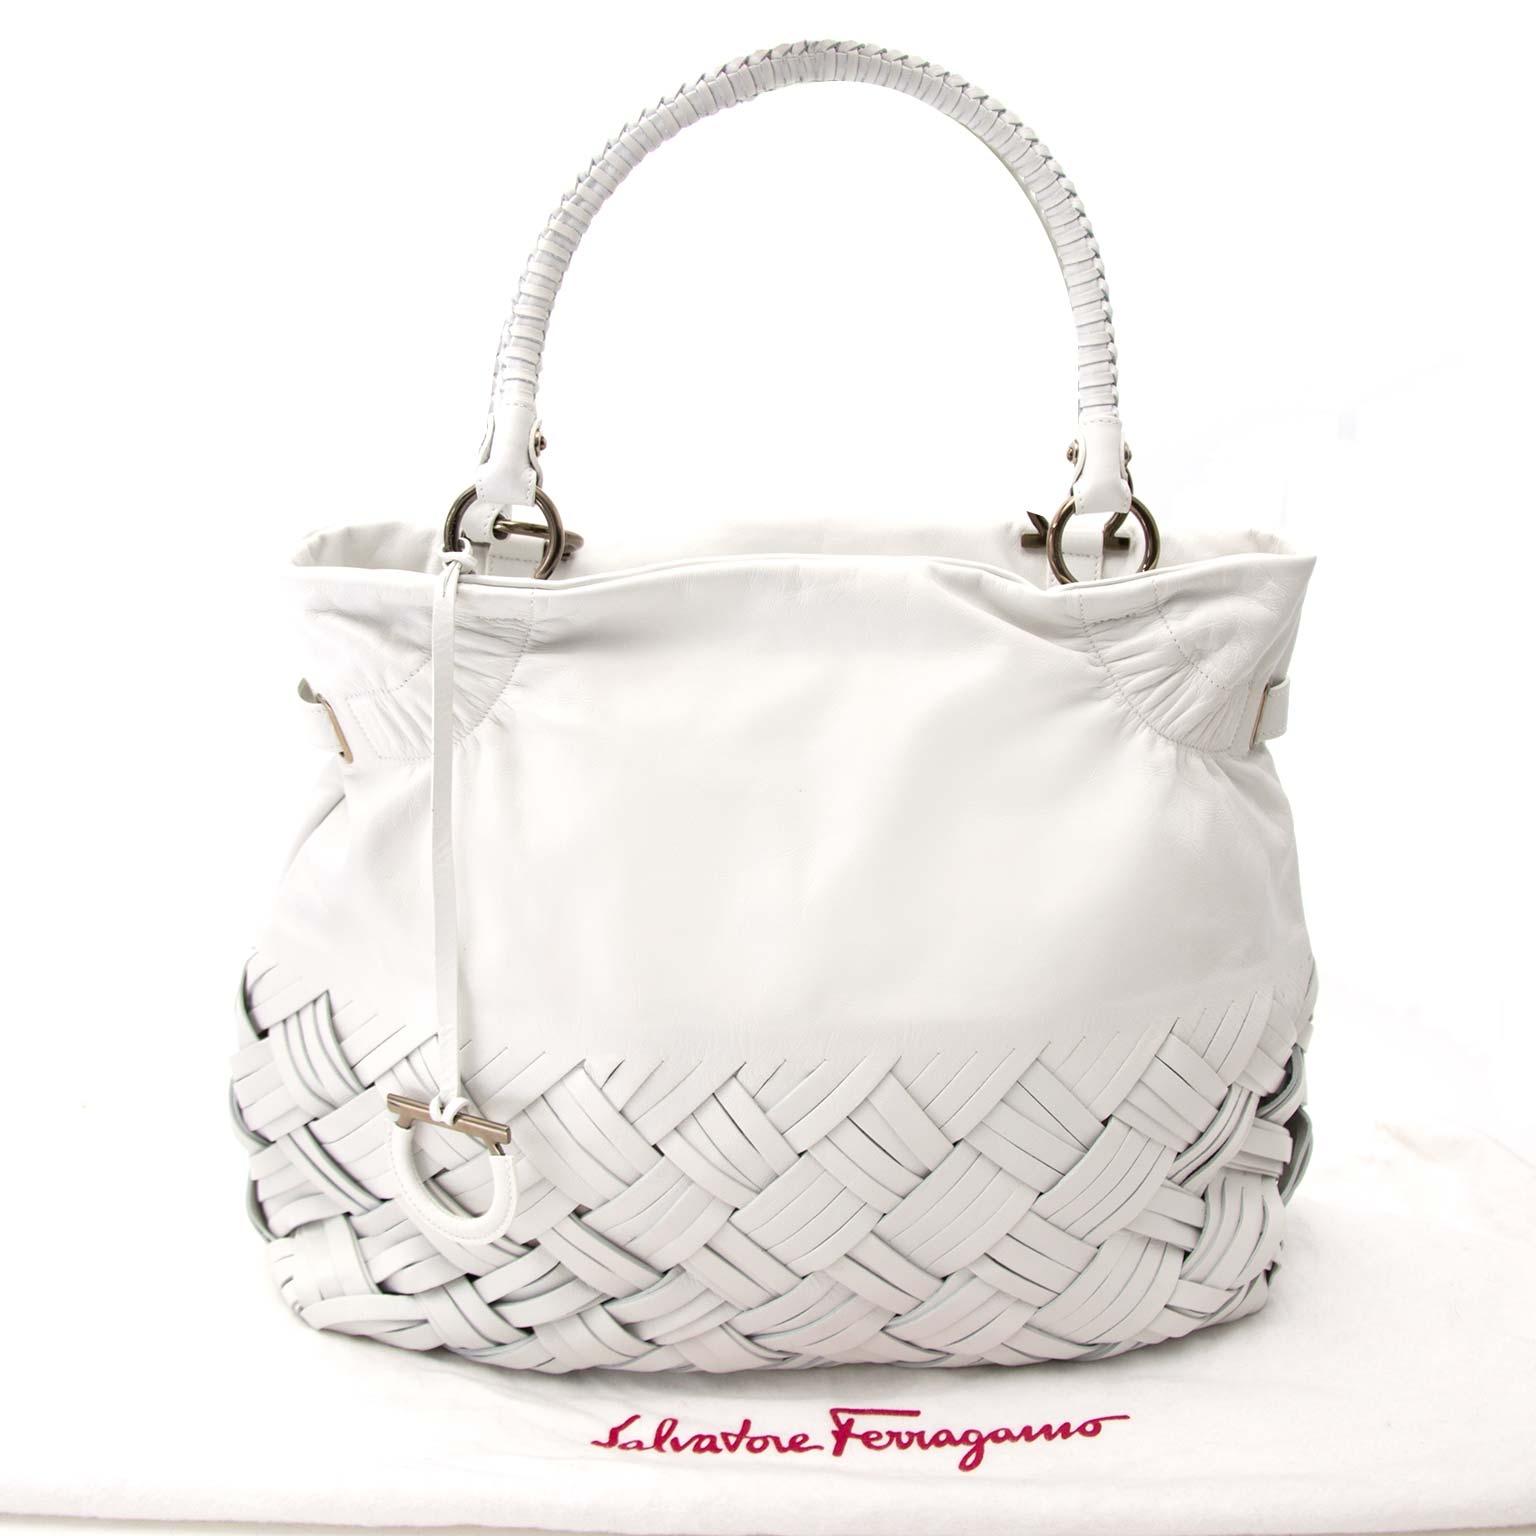 Salvatore Ferragamo White Braided Leather Shoulder Bag te koop